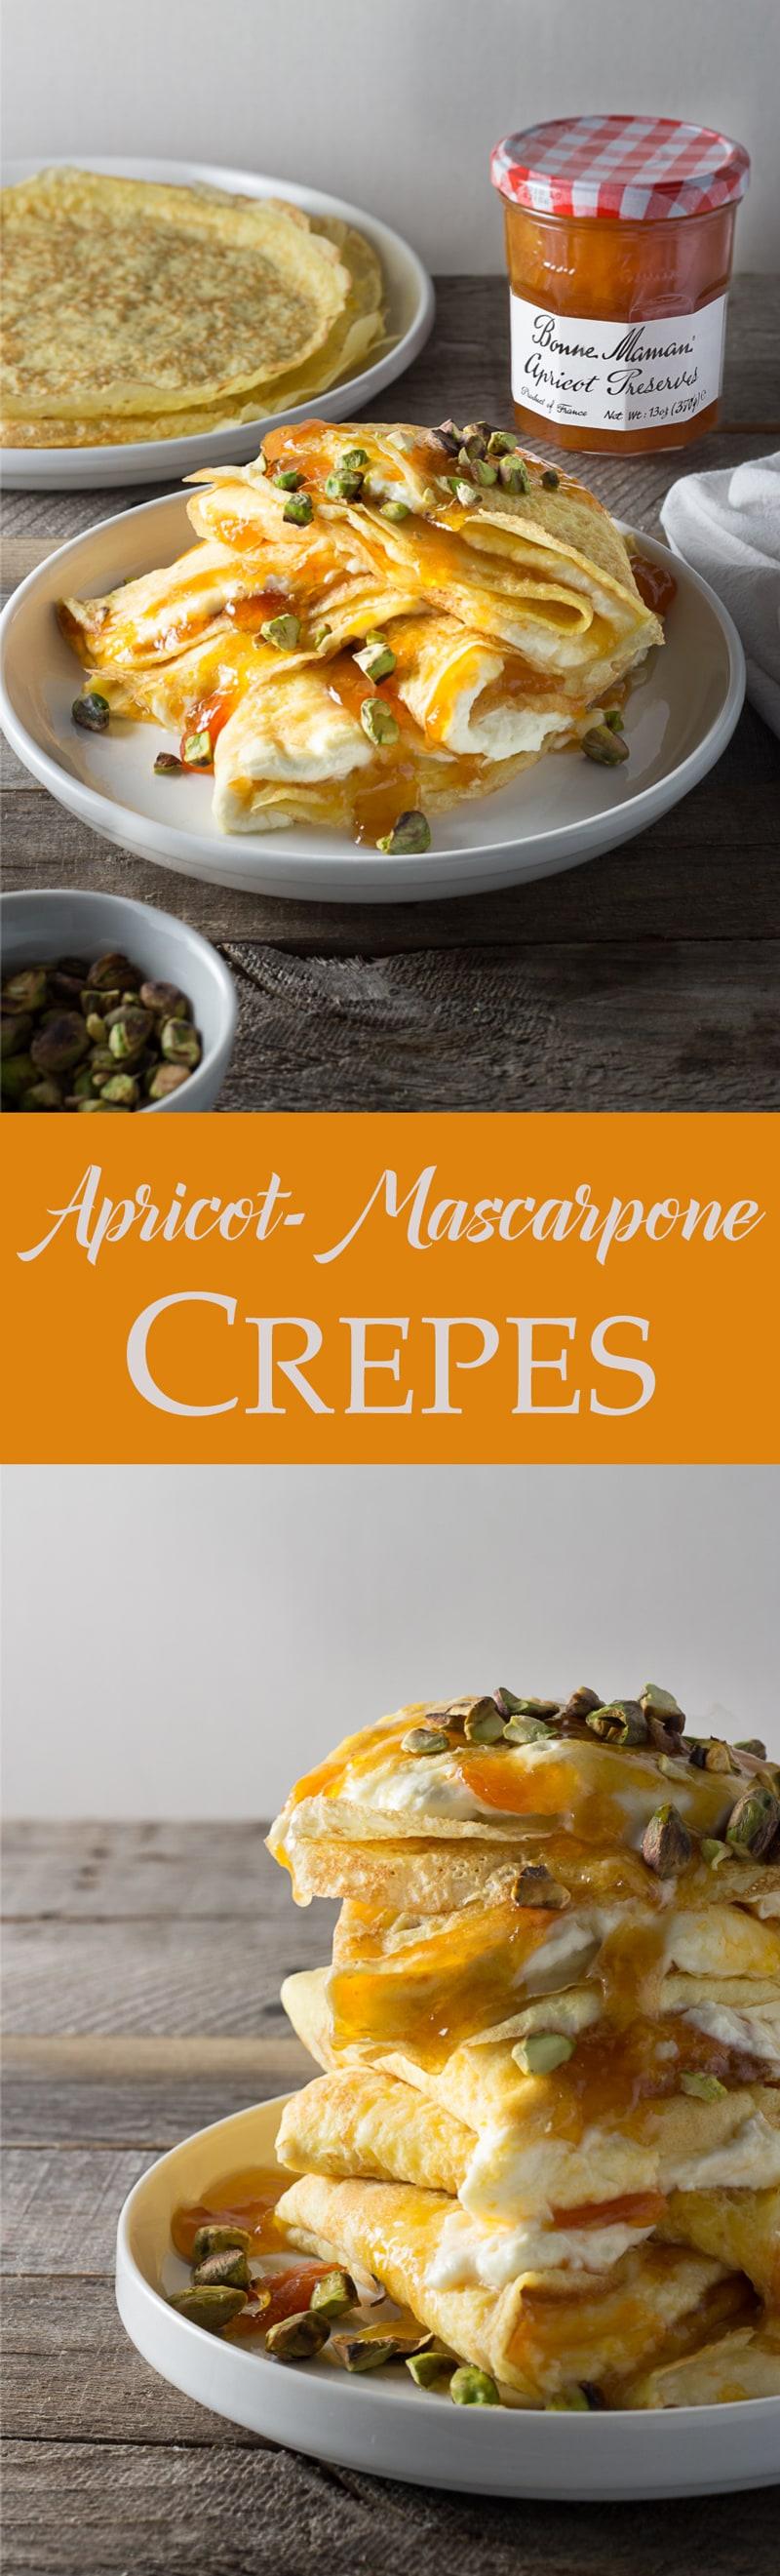 Crepes with Apricot & Whipped Mascarpone Filling | brinasbites.com @Brina's Bites